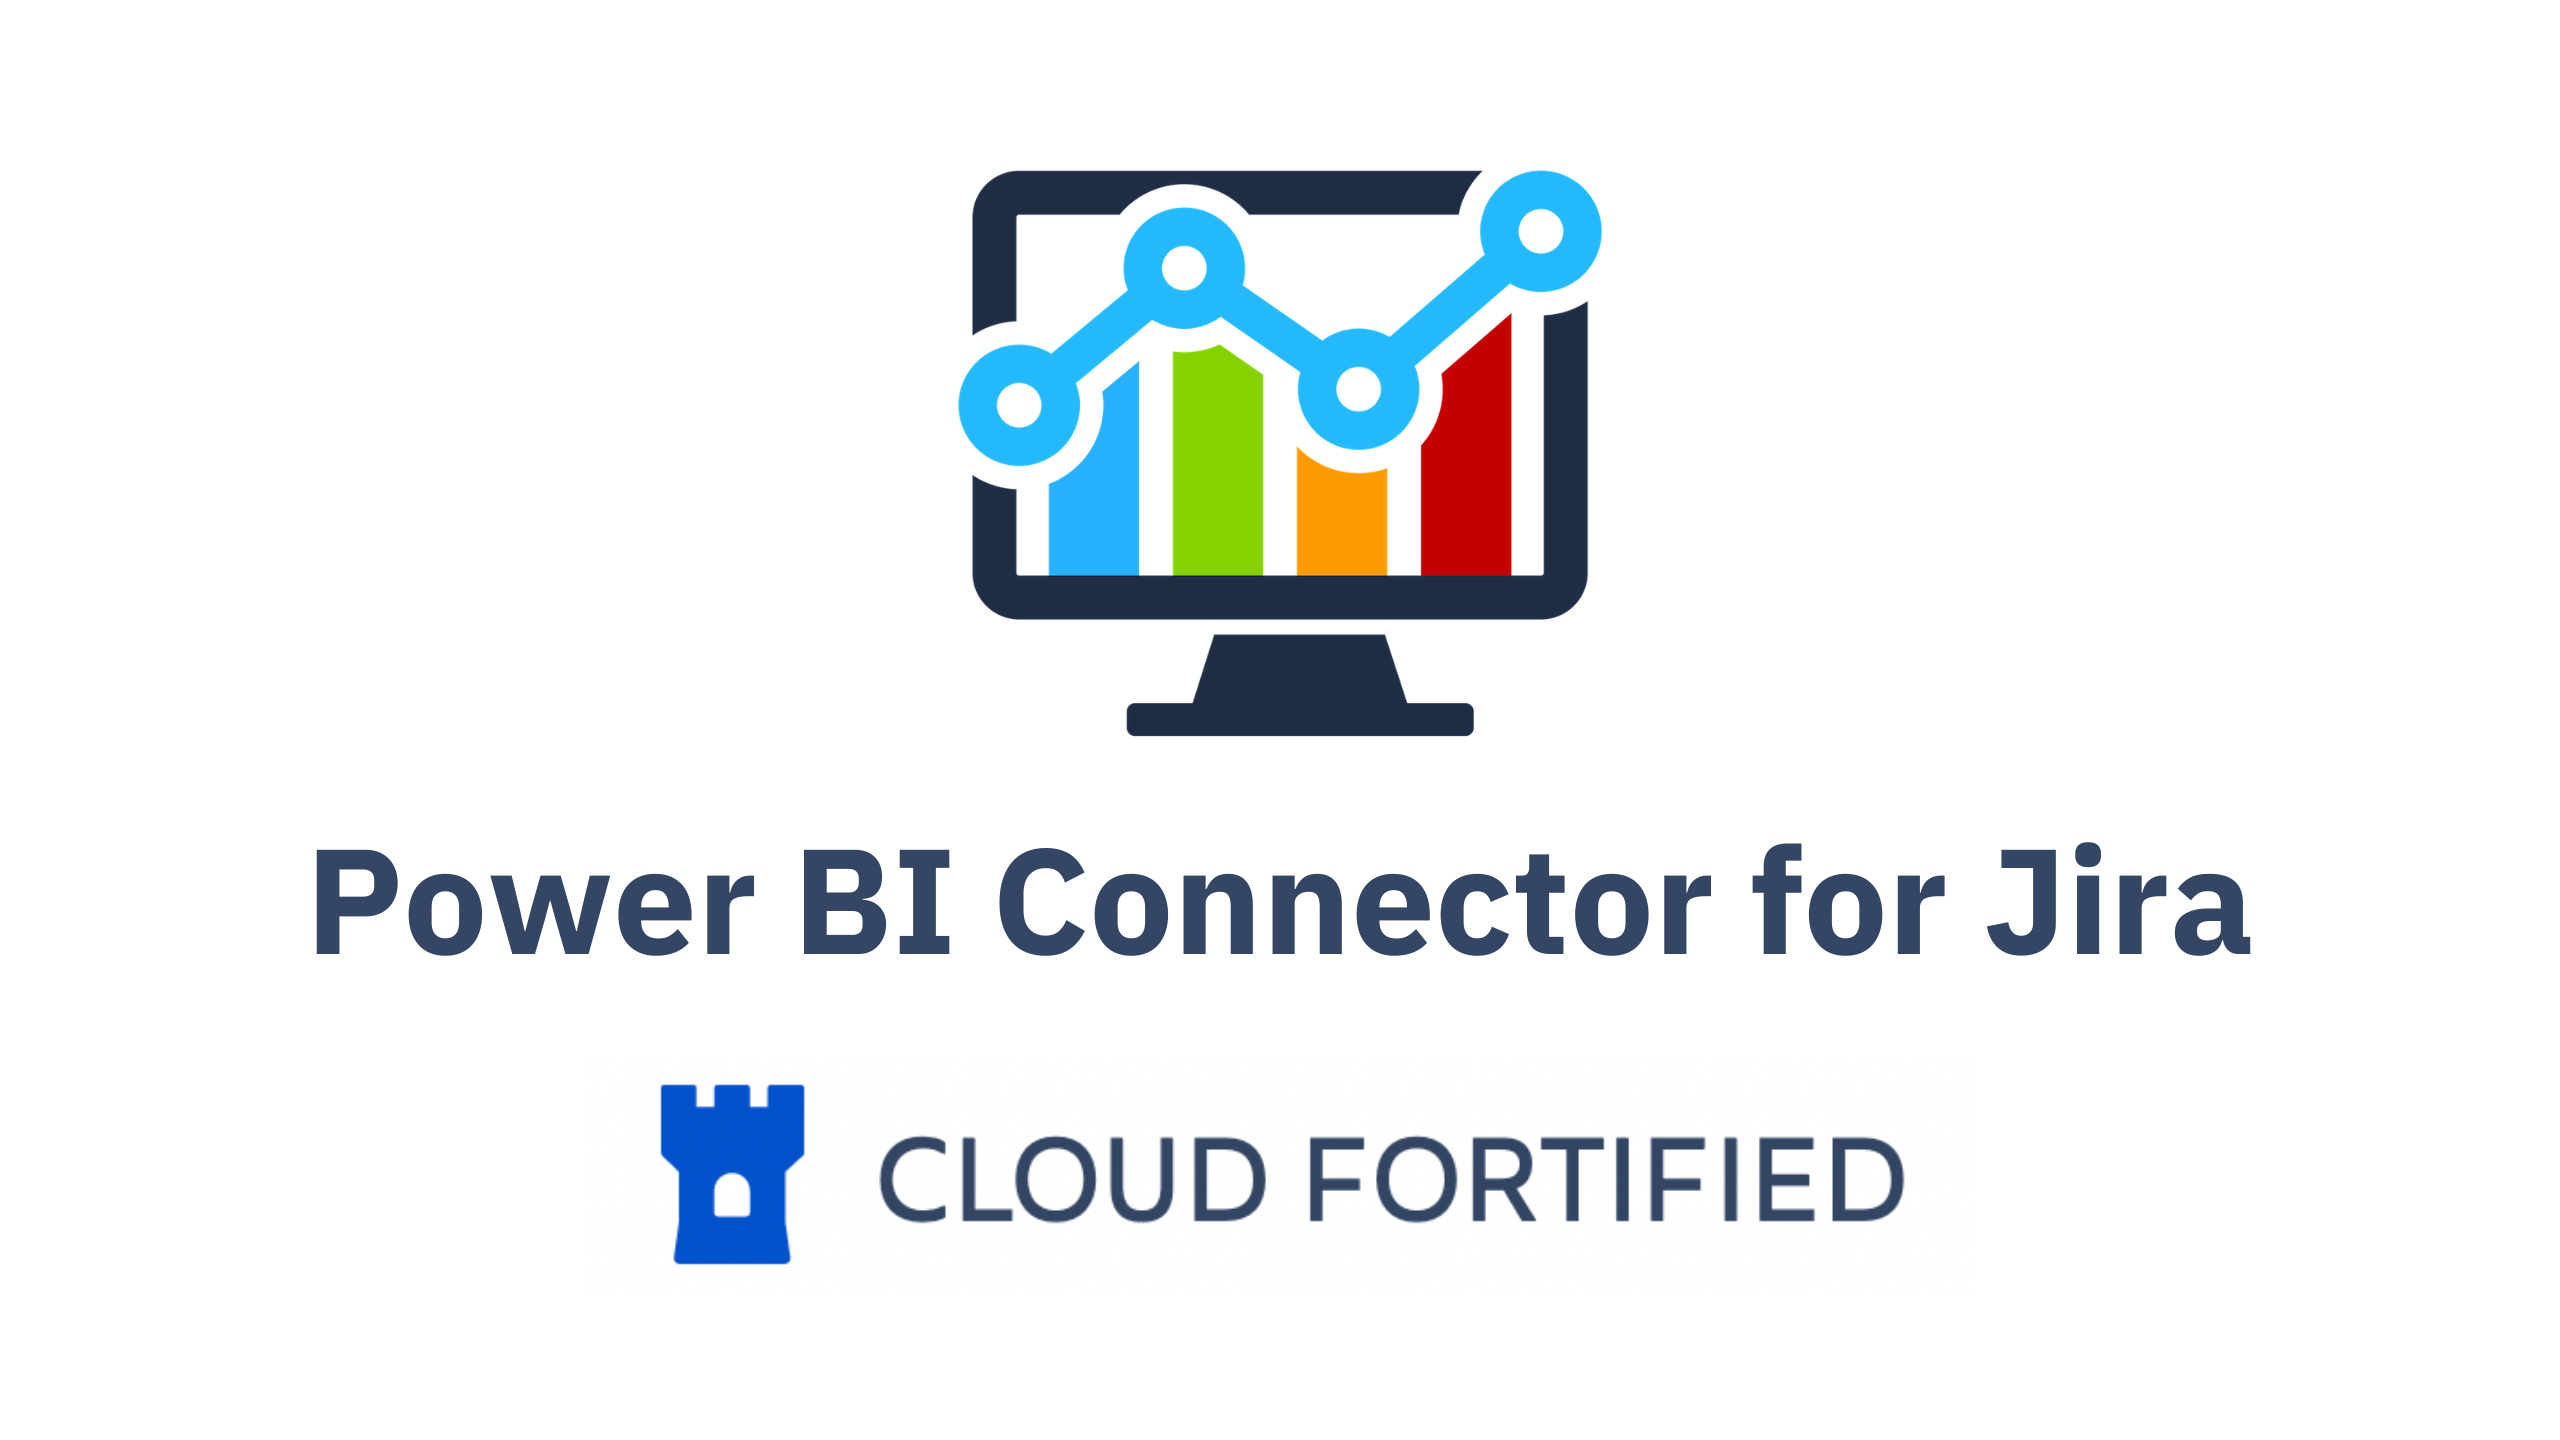 Power BI Connector for Jira is Now an Atlassian Cloud Fortified App